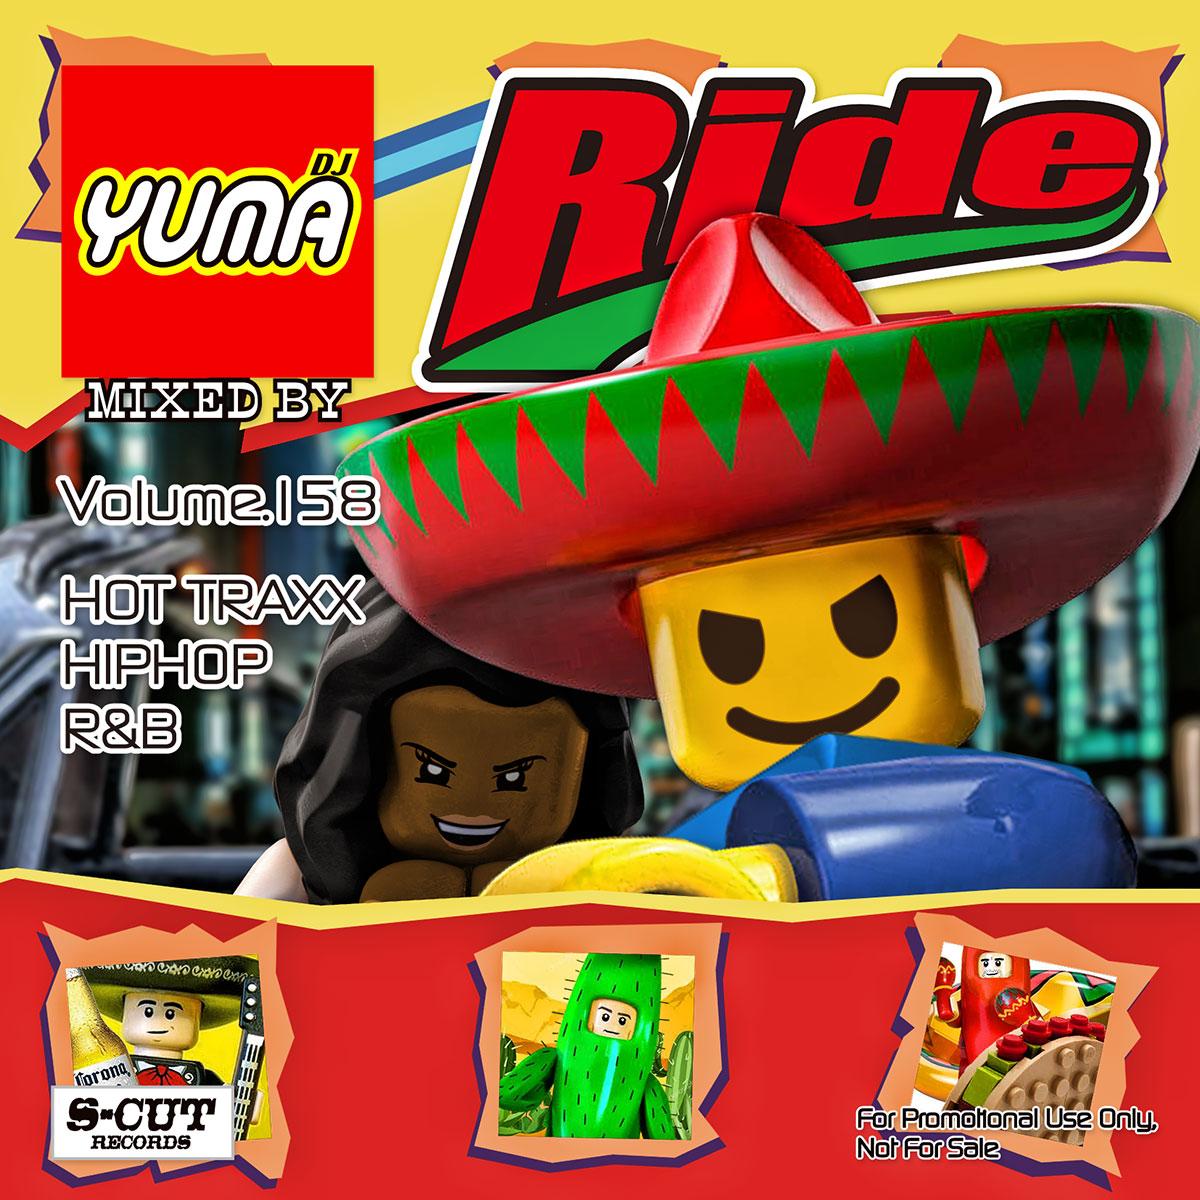 DJ YUMA マート 限定モデル RIDE HIP HOP MIX Volume.158 あす楽対応 CD RB